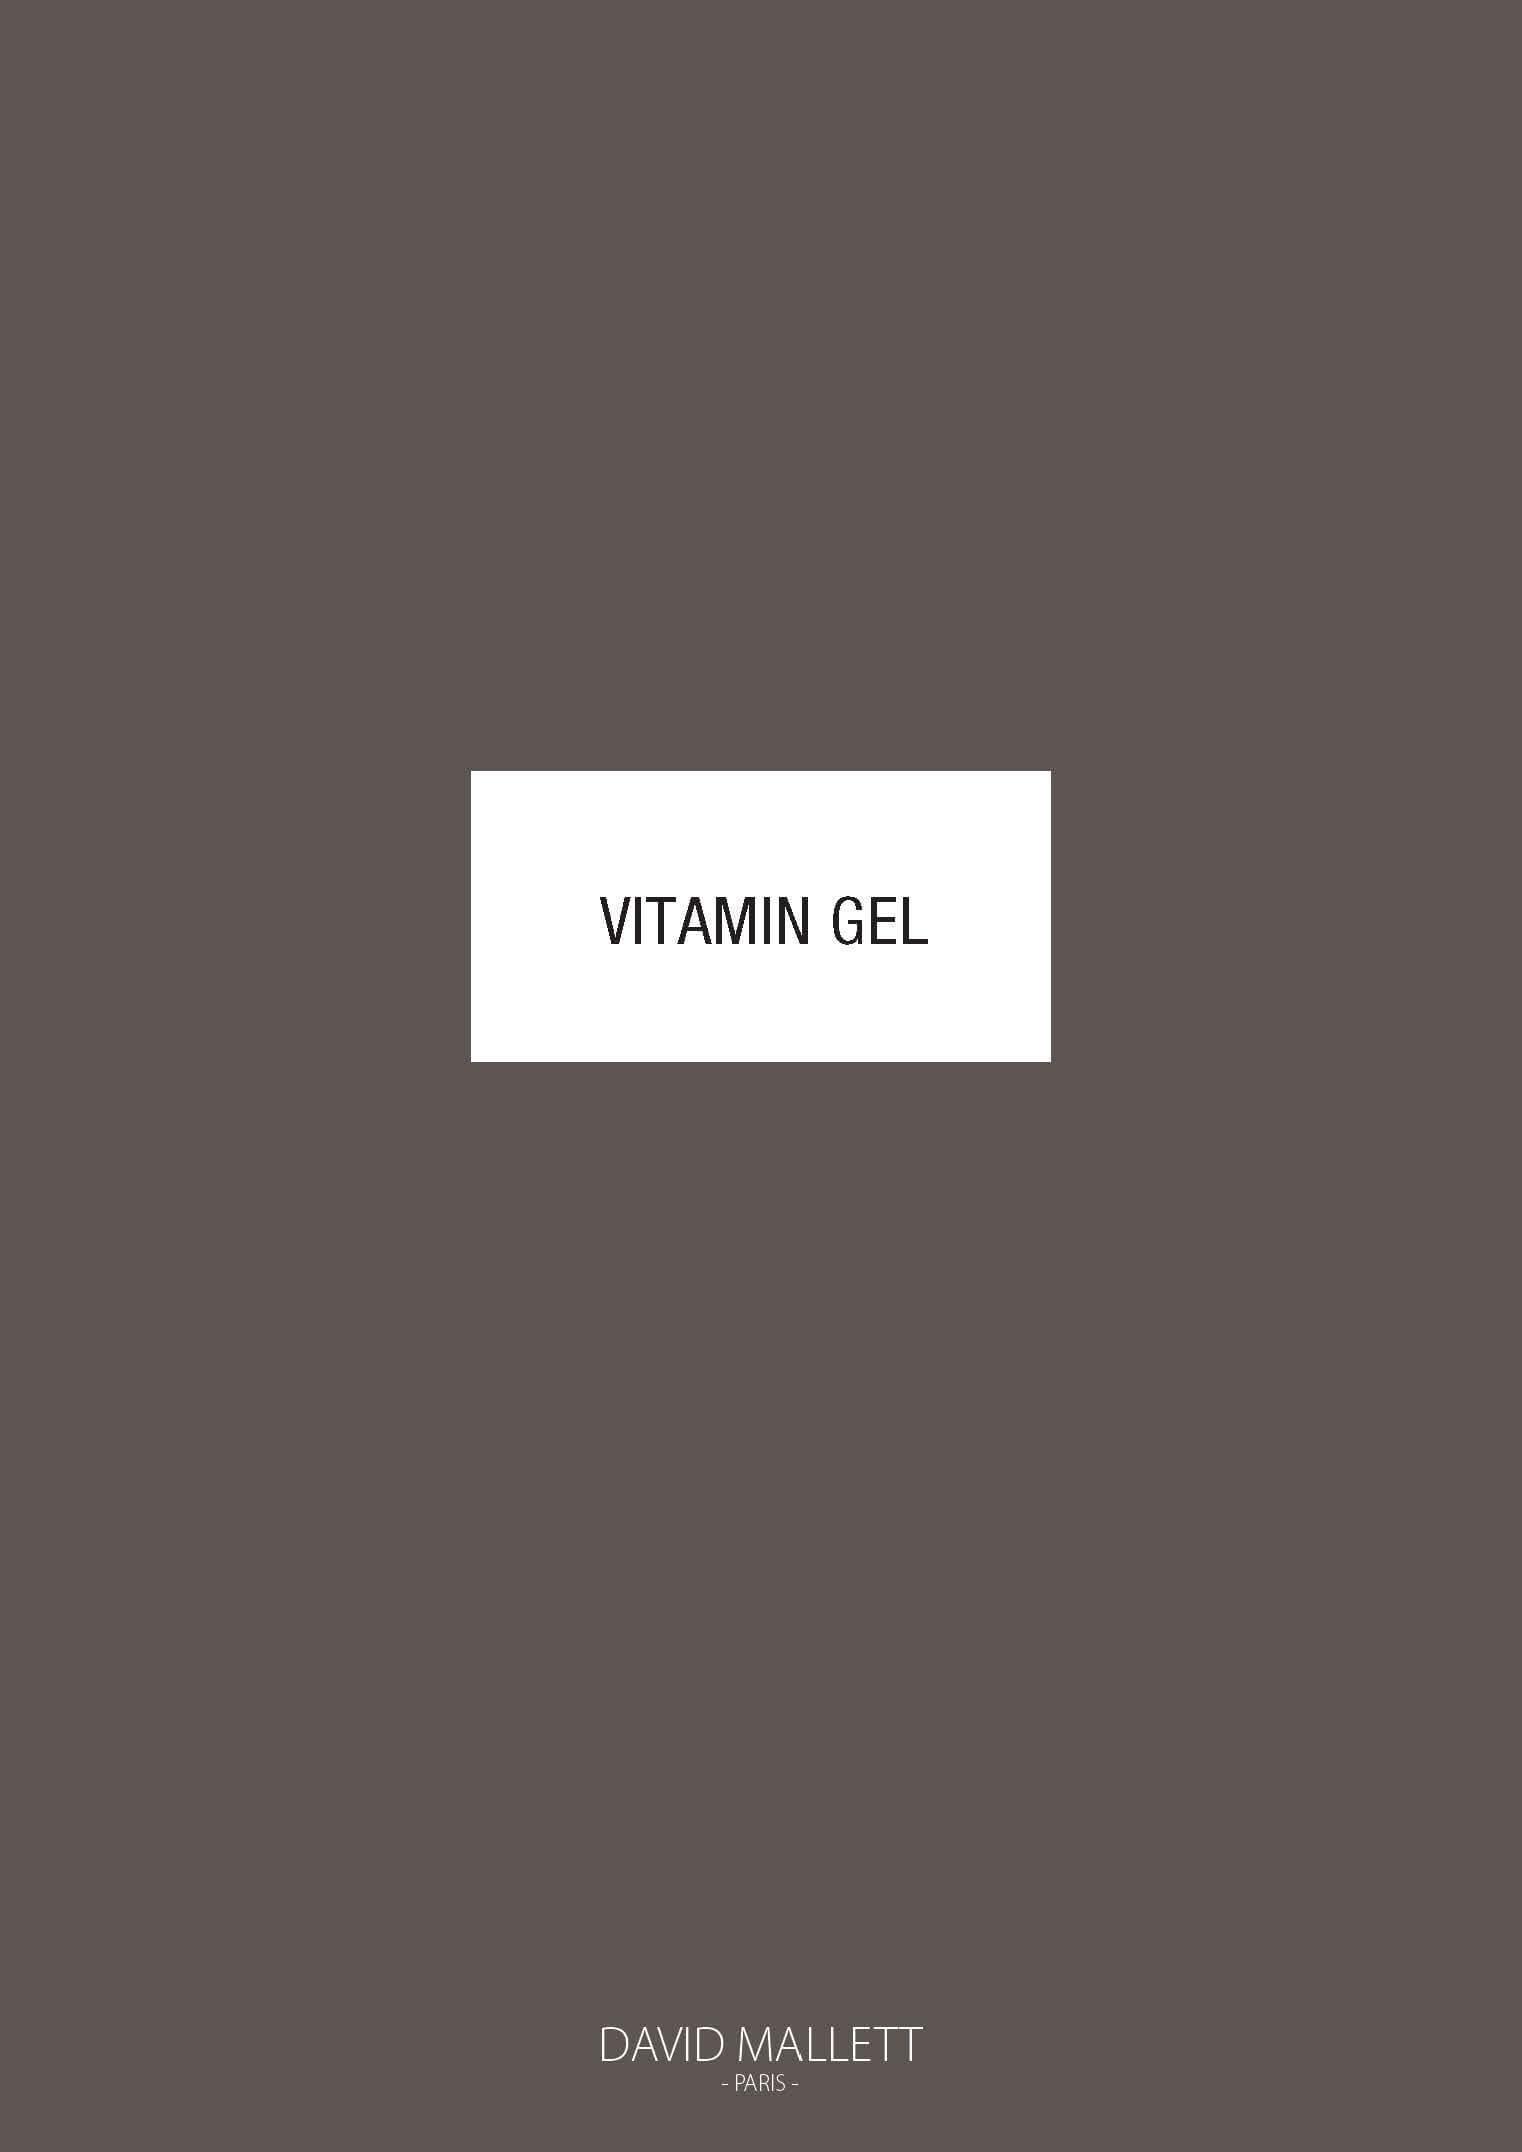 Vitamin Gel FR